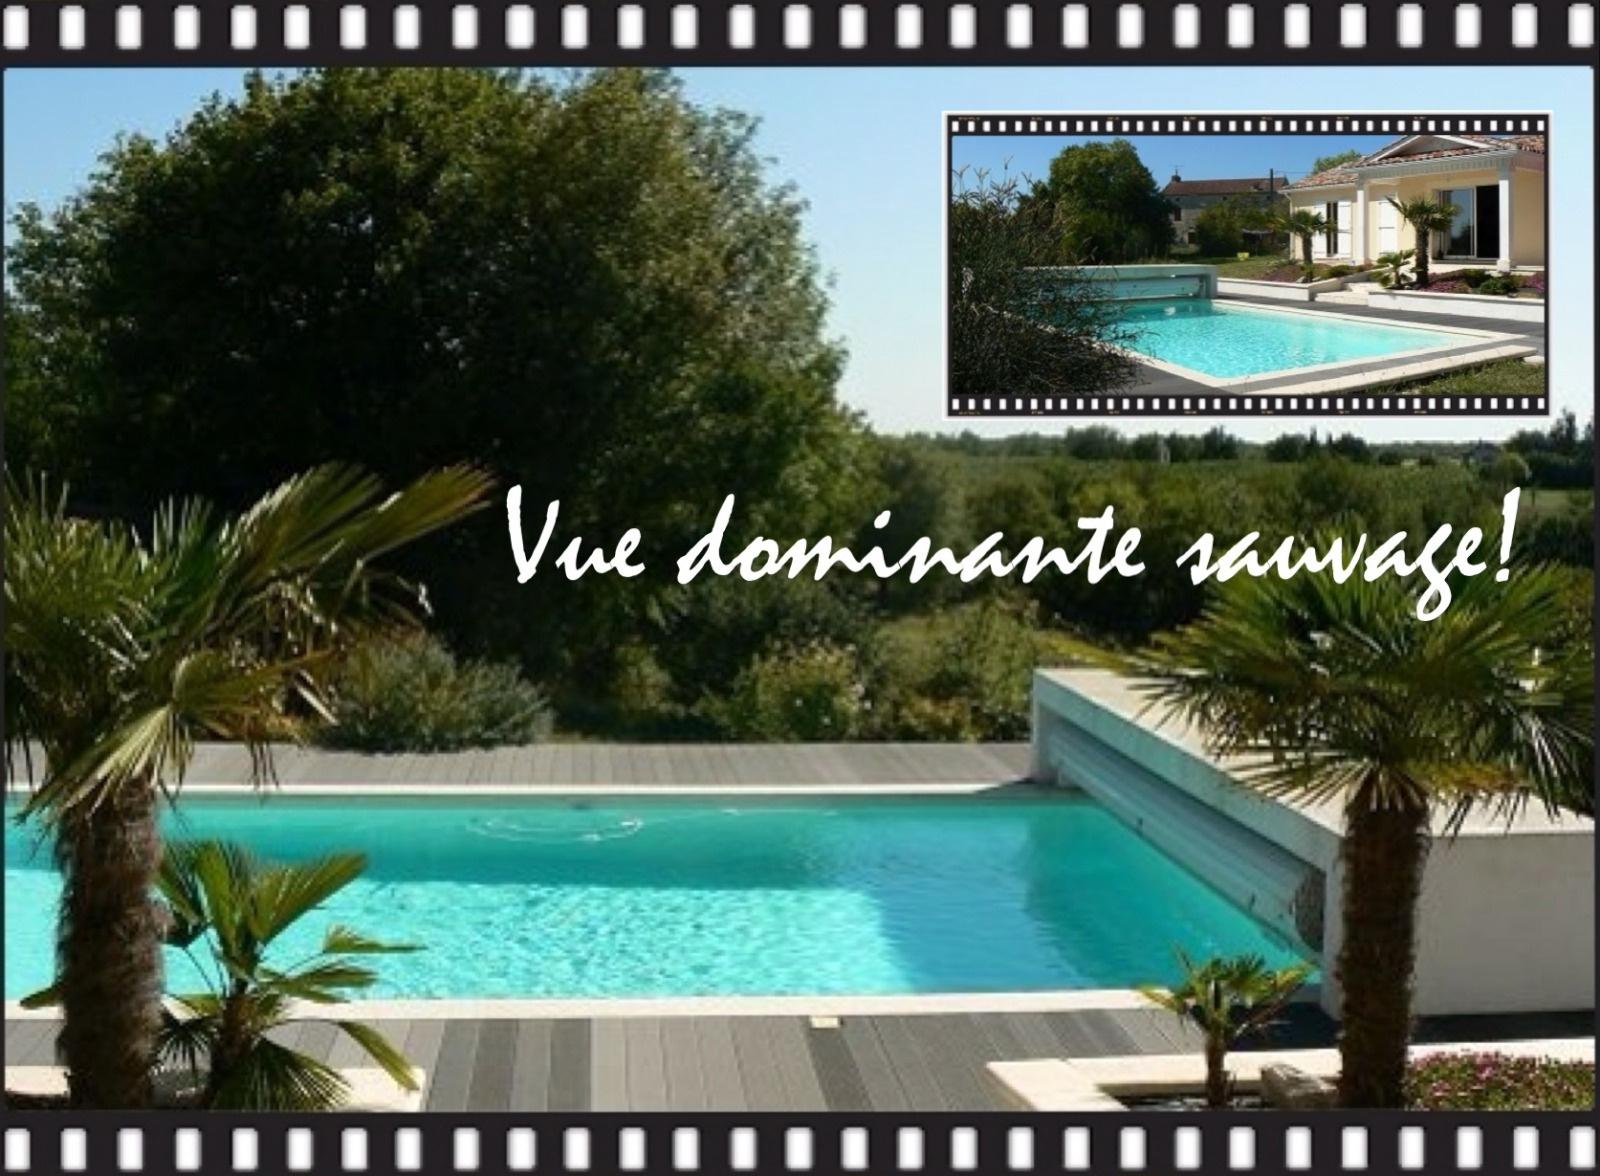 Annonce vente maison cahors 46000 167 m 283 500 for Camping cahors avec piscine